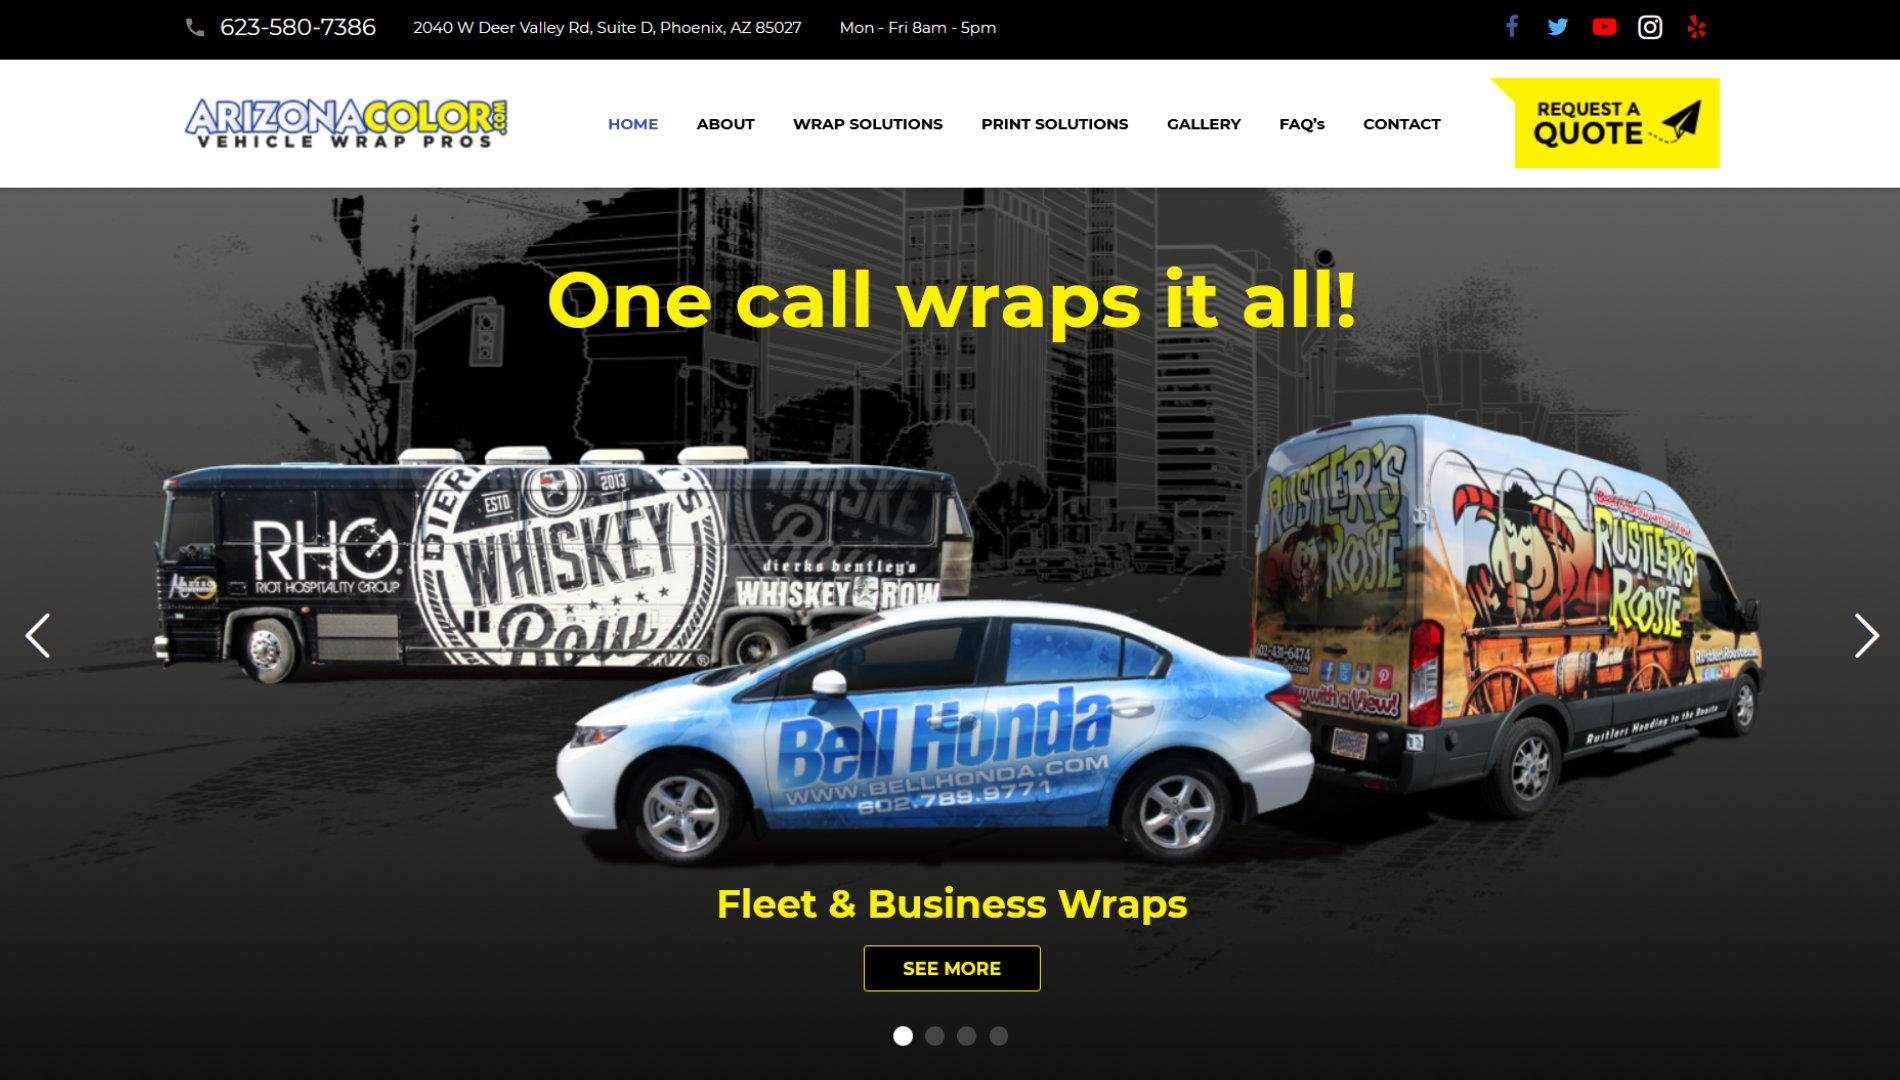 Arizona Color Vehicle Wrap Professionals in Phoenix